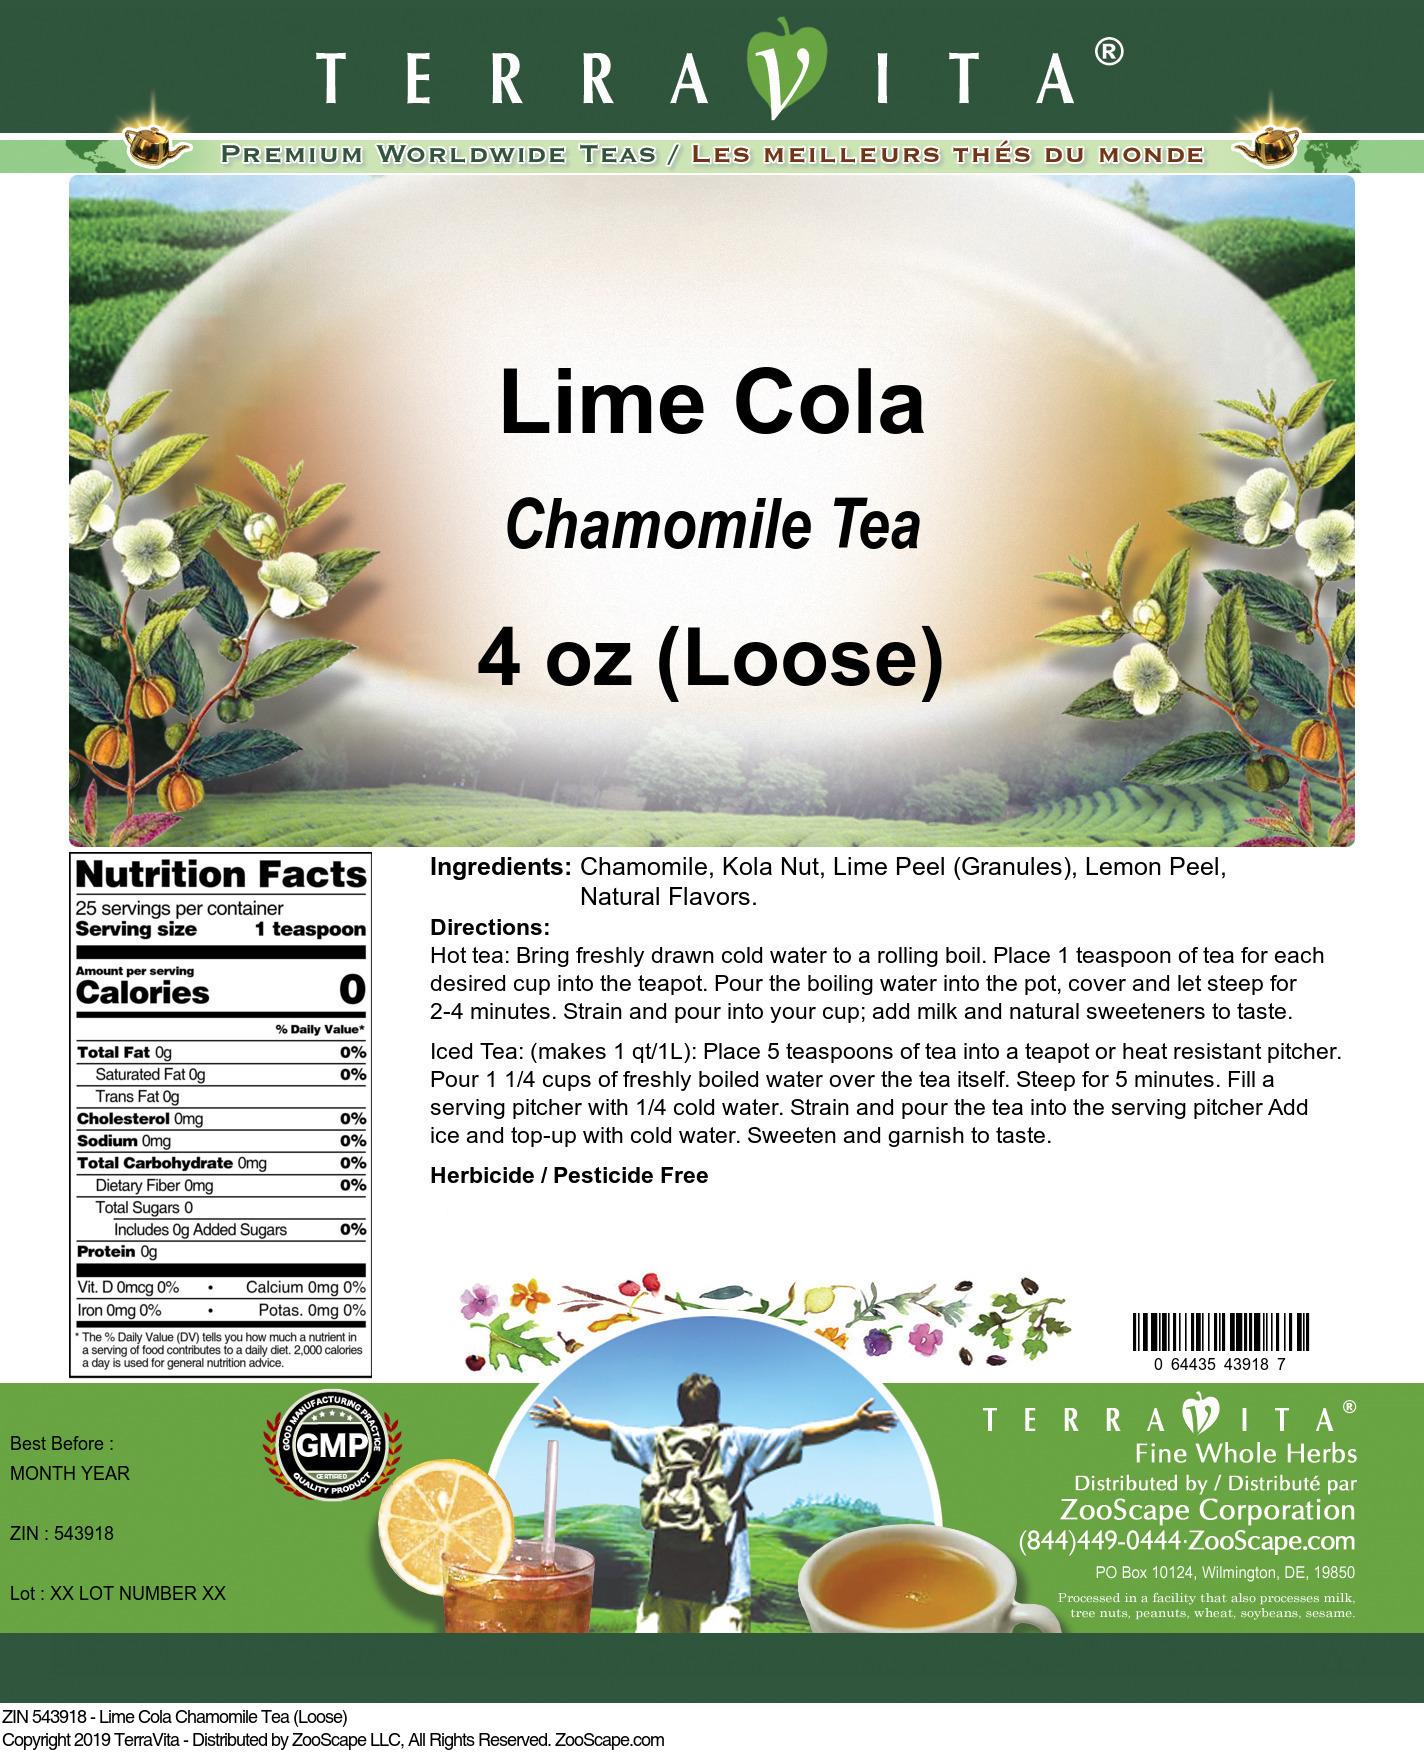 Lime Cola Chamomile Tea (Loose)